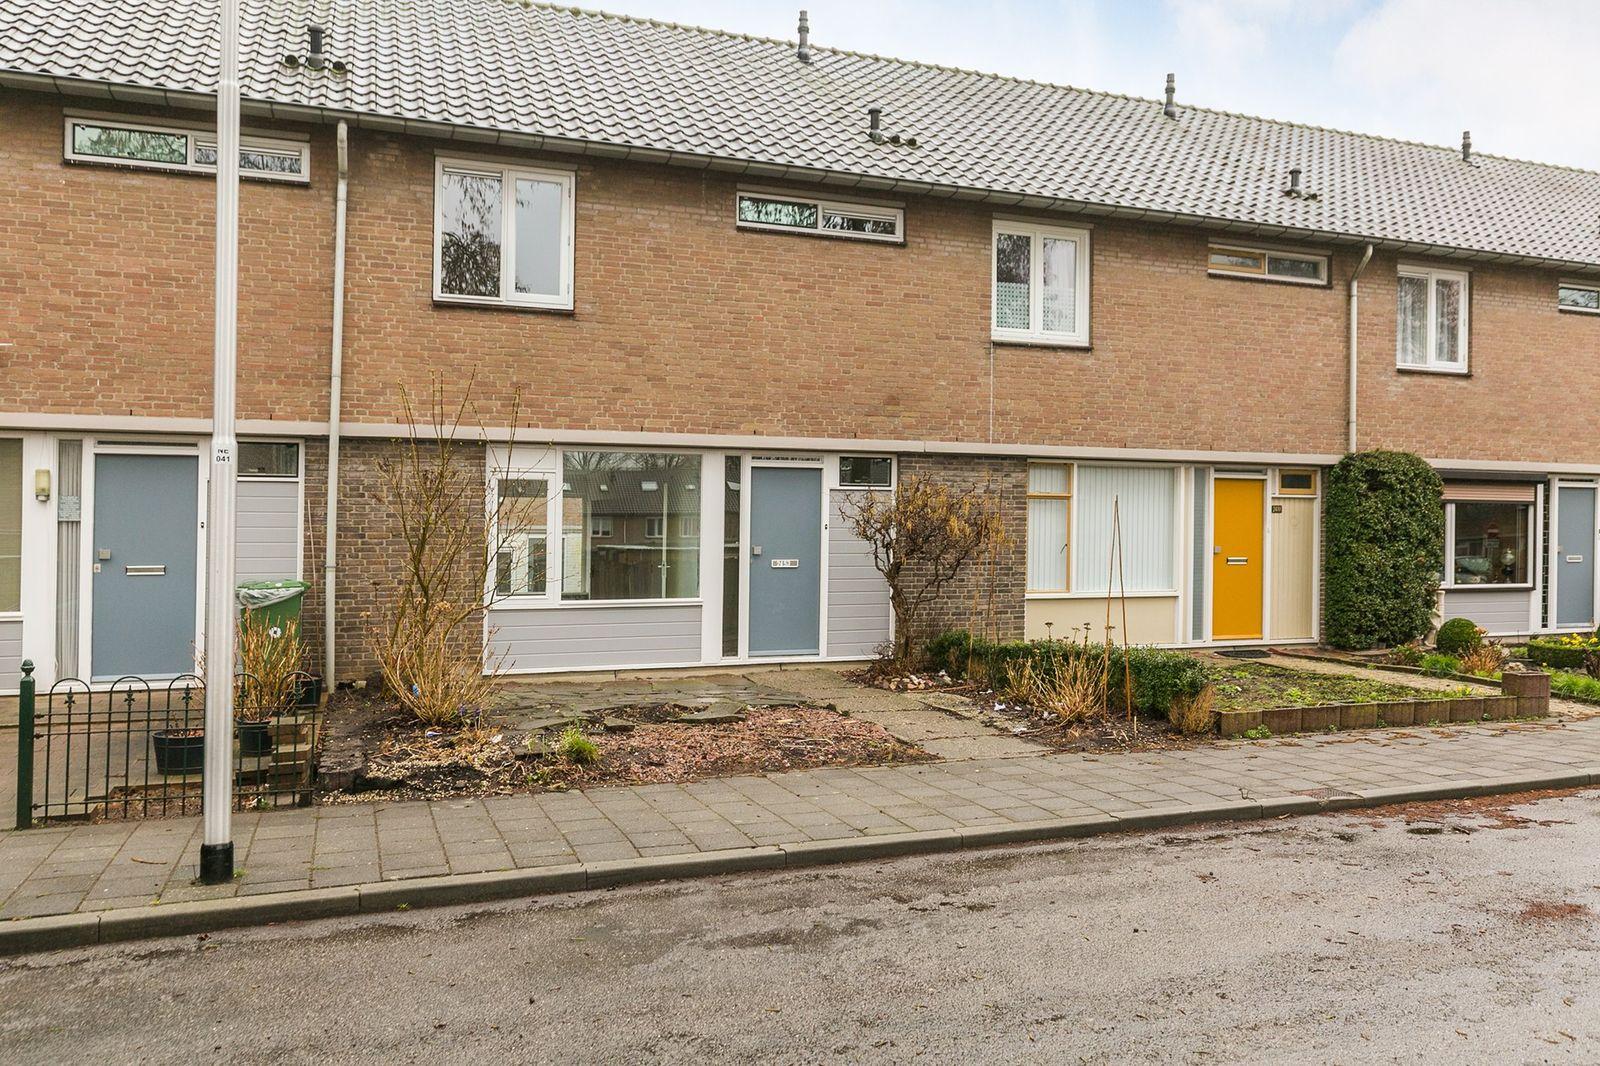 Malvert 2453, Nijmegen